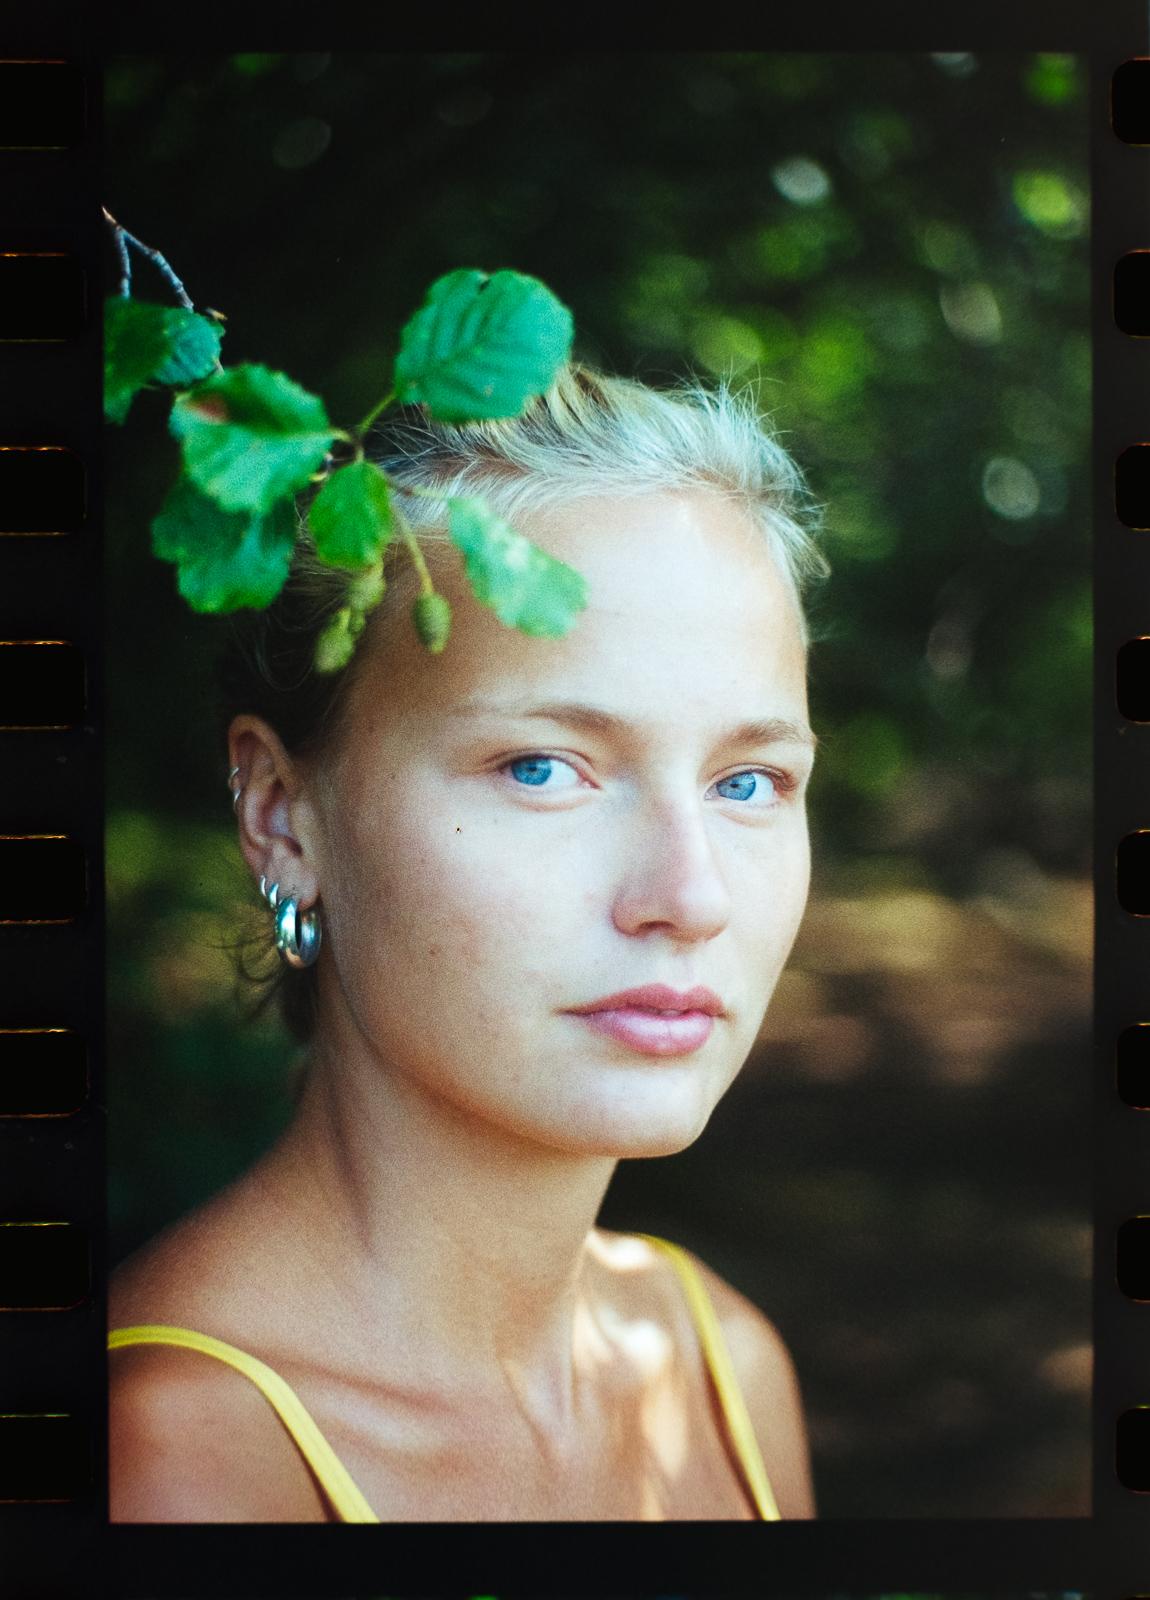 Film photography, almjohannes, film, johannes alm, minolta x500, fashion photography